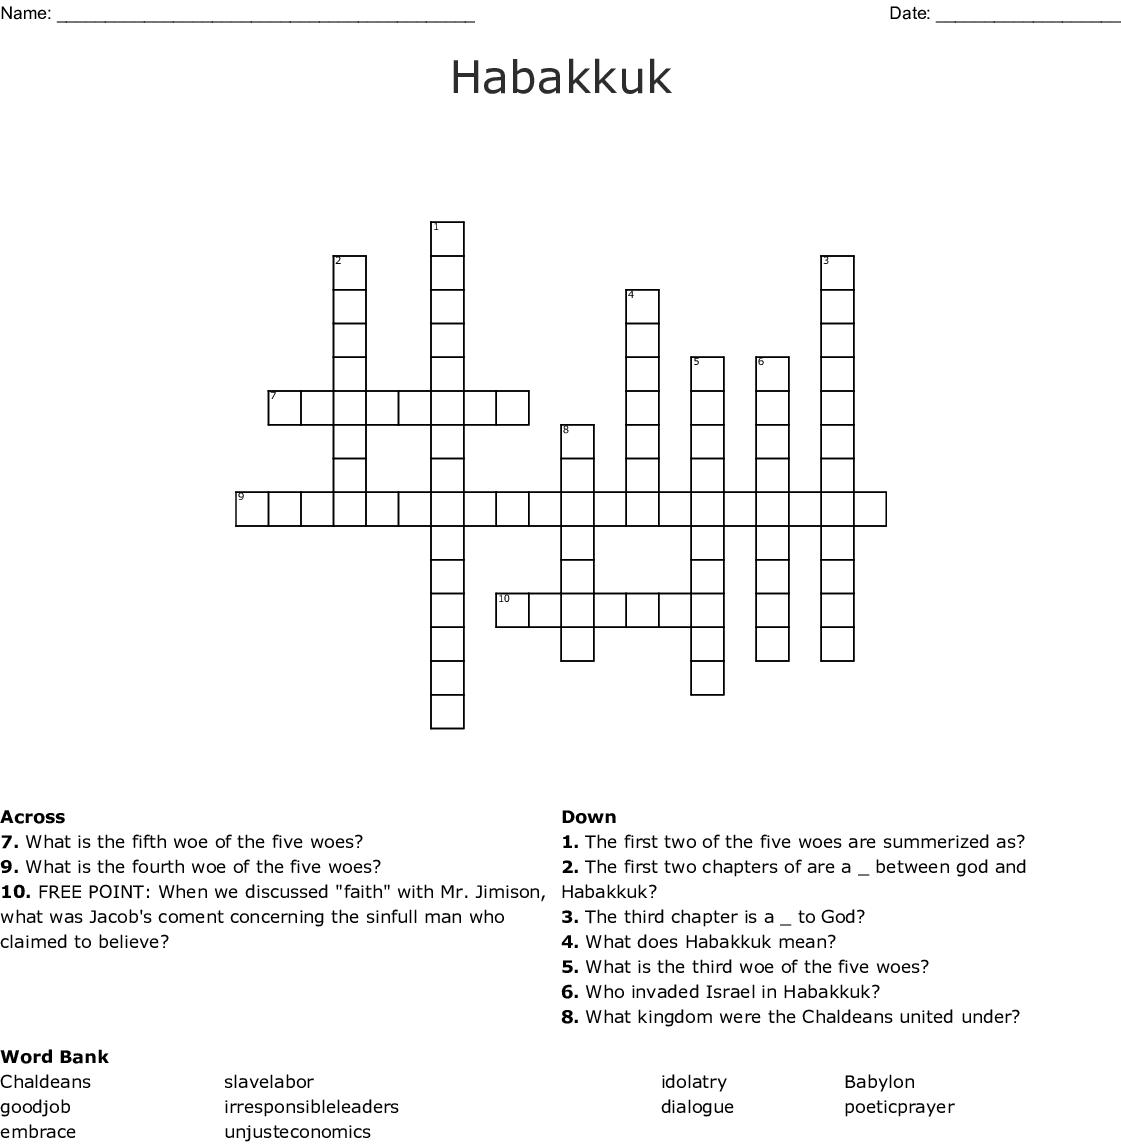 Habakkuk Crossword